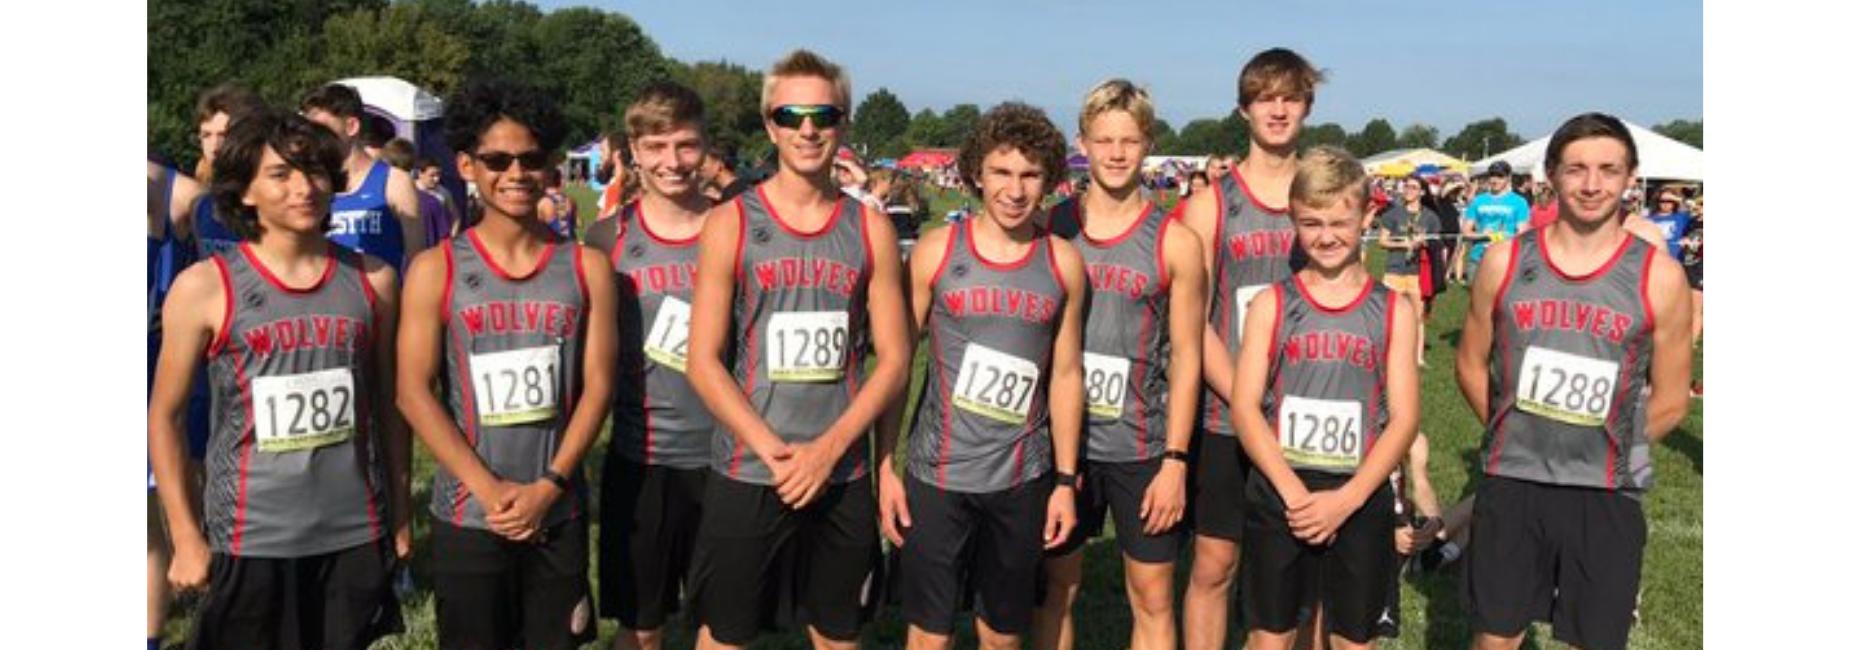 Boys cross country team